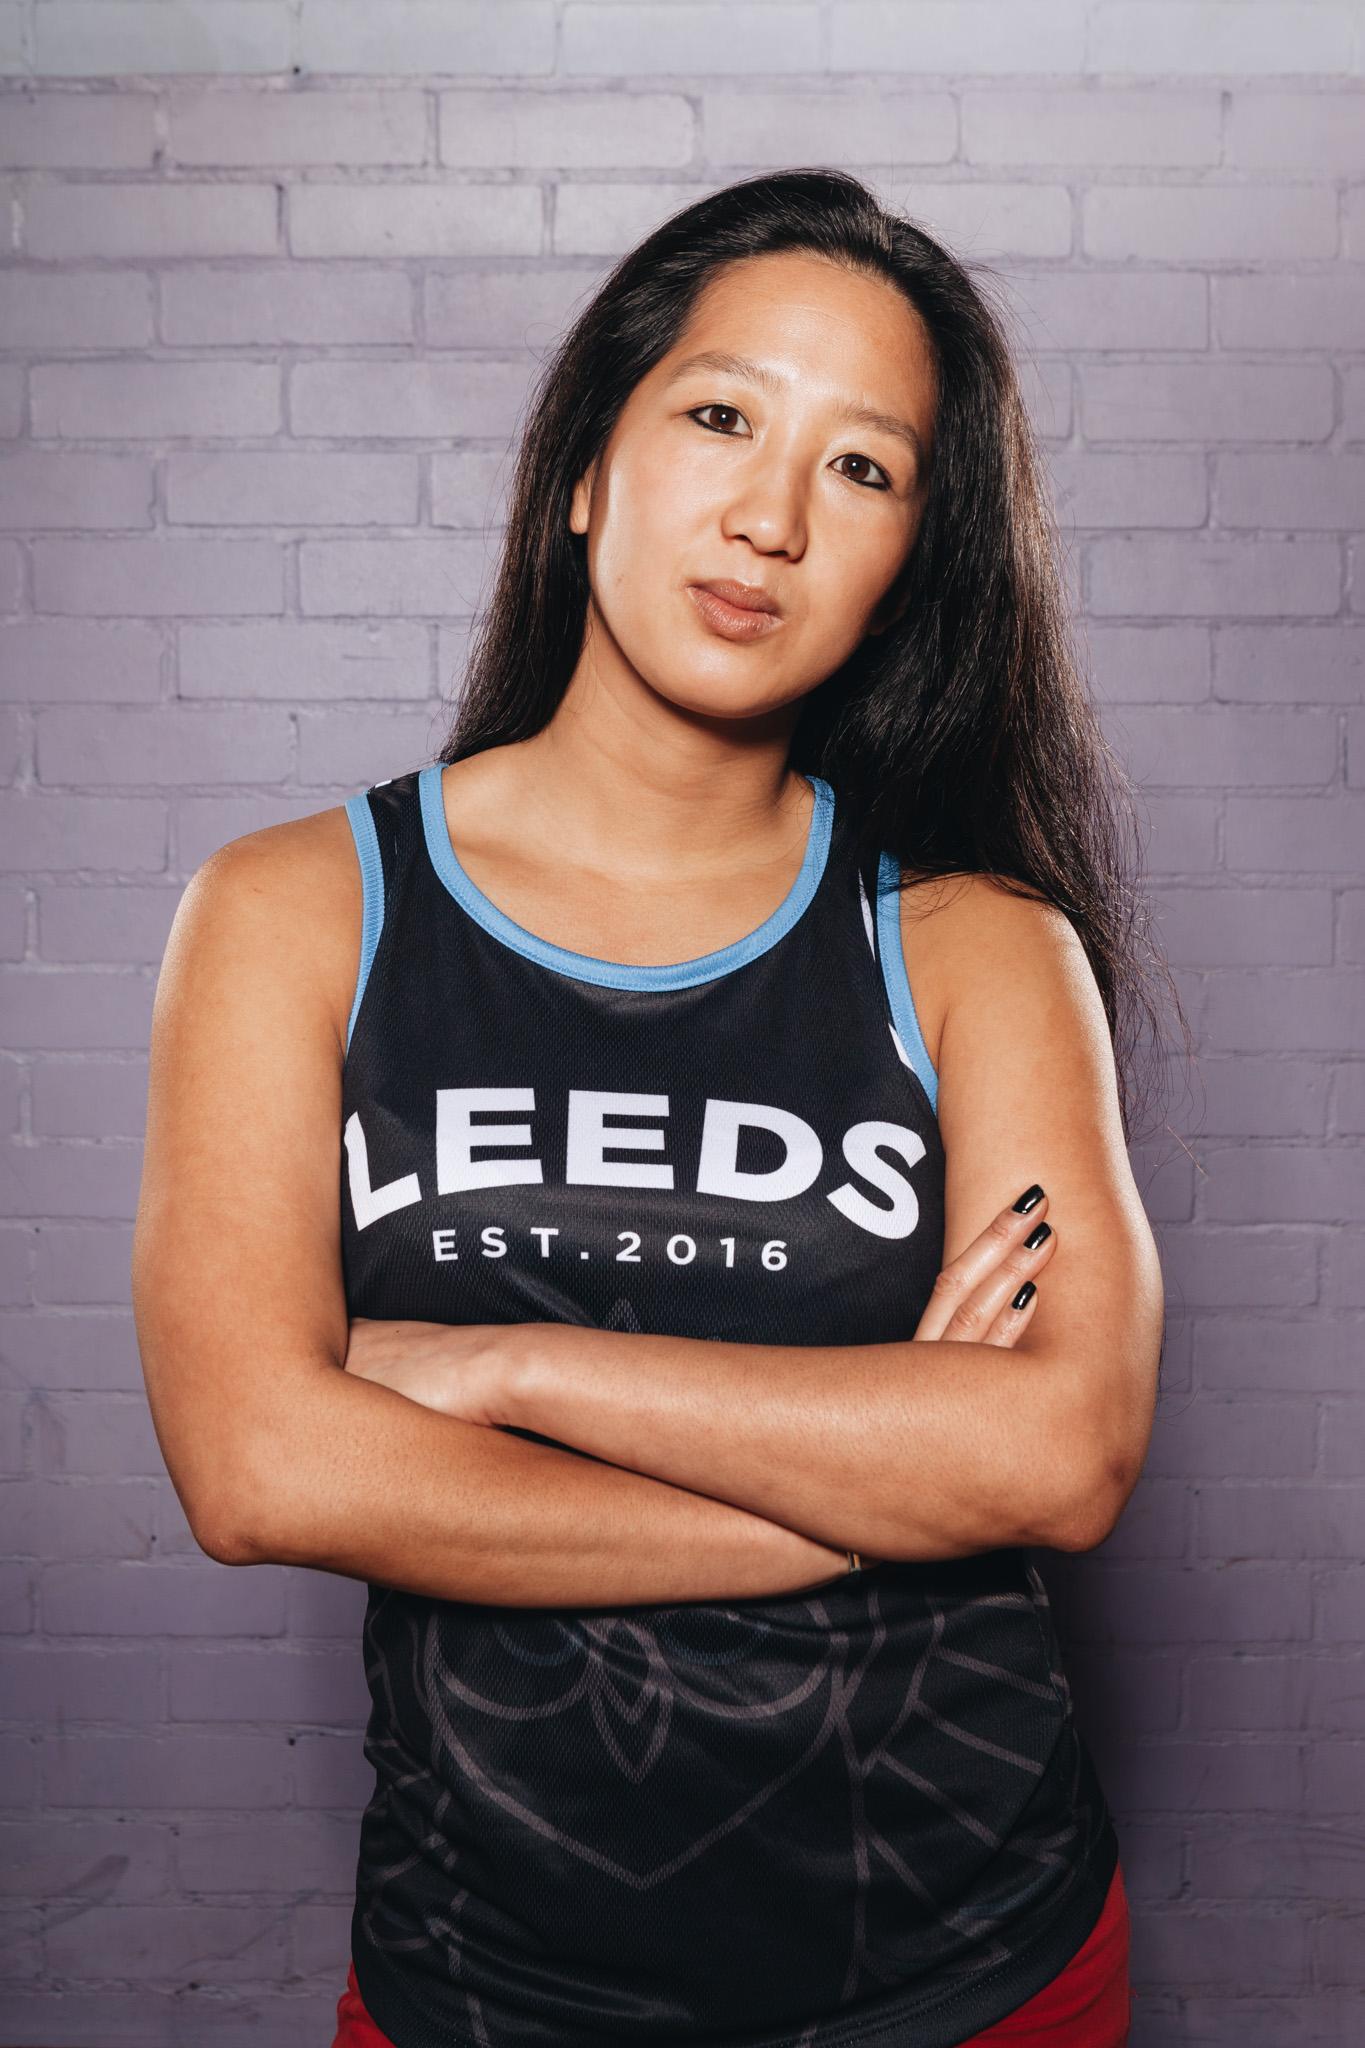 ©TomWoollard_Womens-Leeds-Roller-Derby-Team-Super-Noodle-0144.jpg